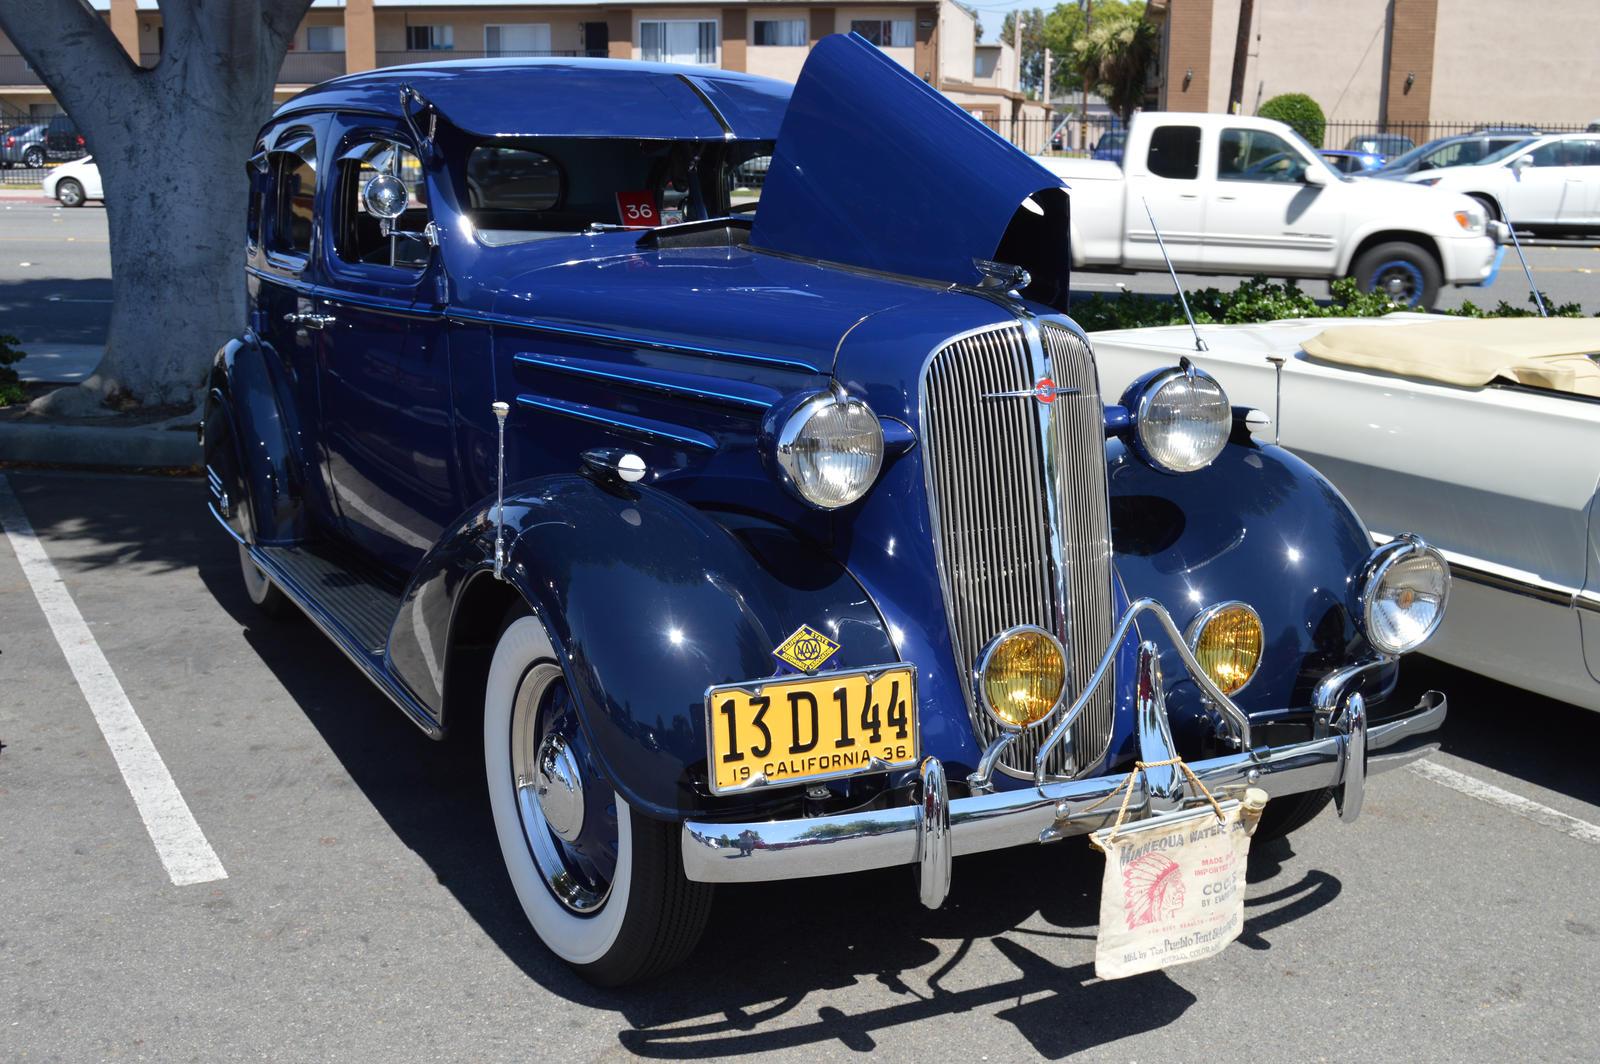 1936 chevrolet four door sedan ix by brooklyn47 on deviantart for 1936 chevrolet 4 door sedan